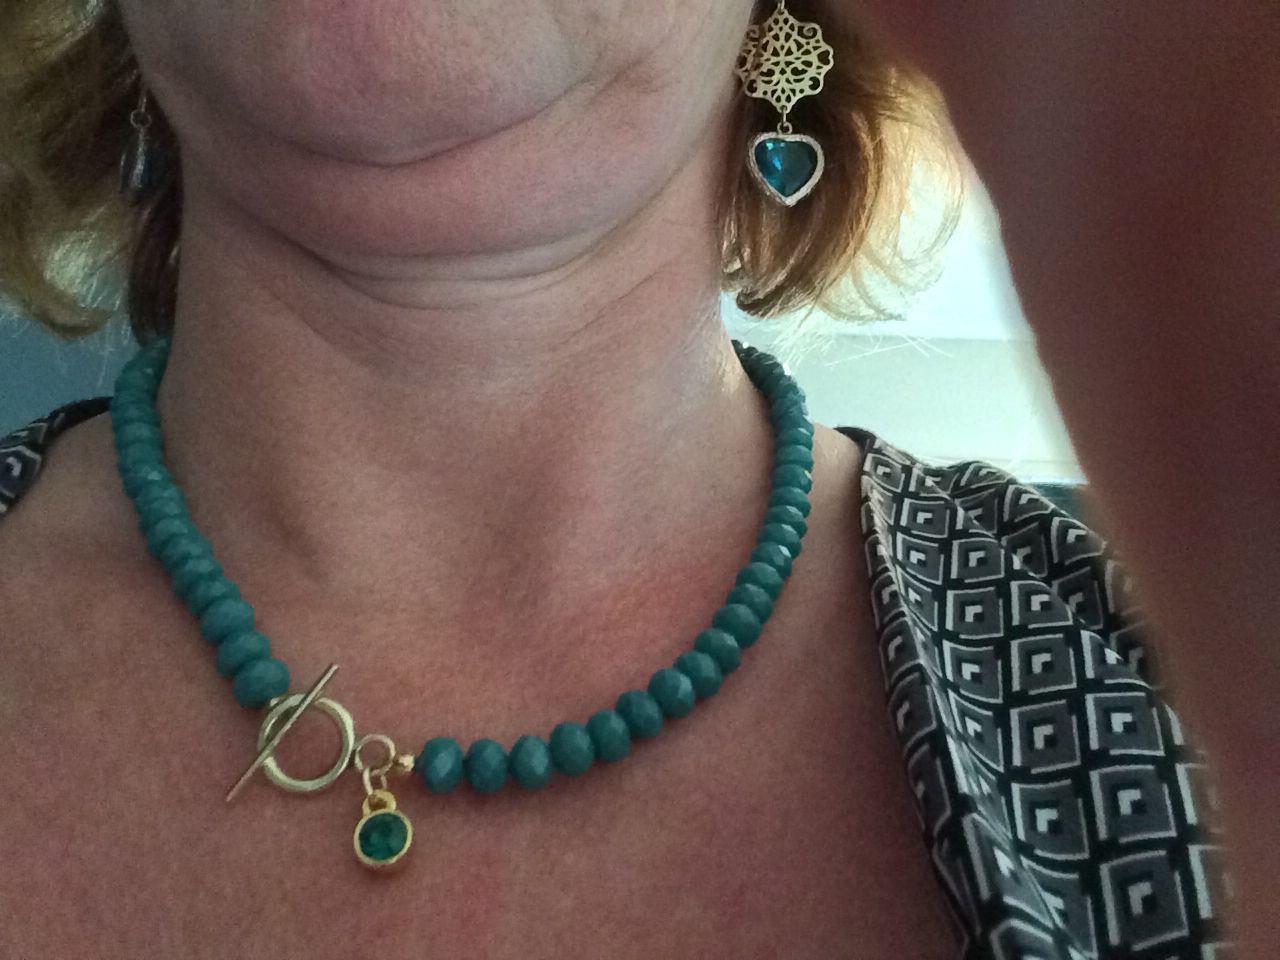 Mooie nieuwe halsketting gemaakt in smaragd groen.